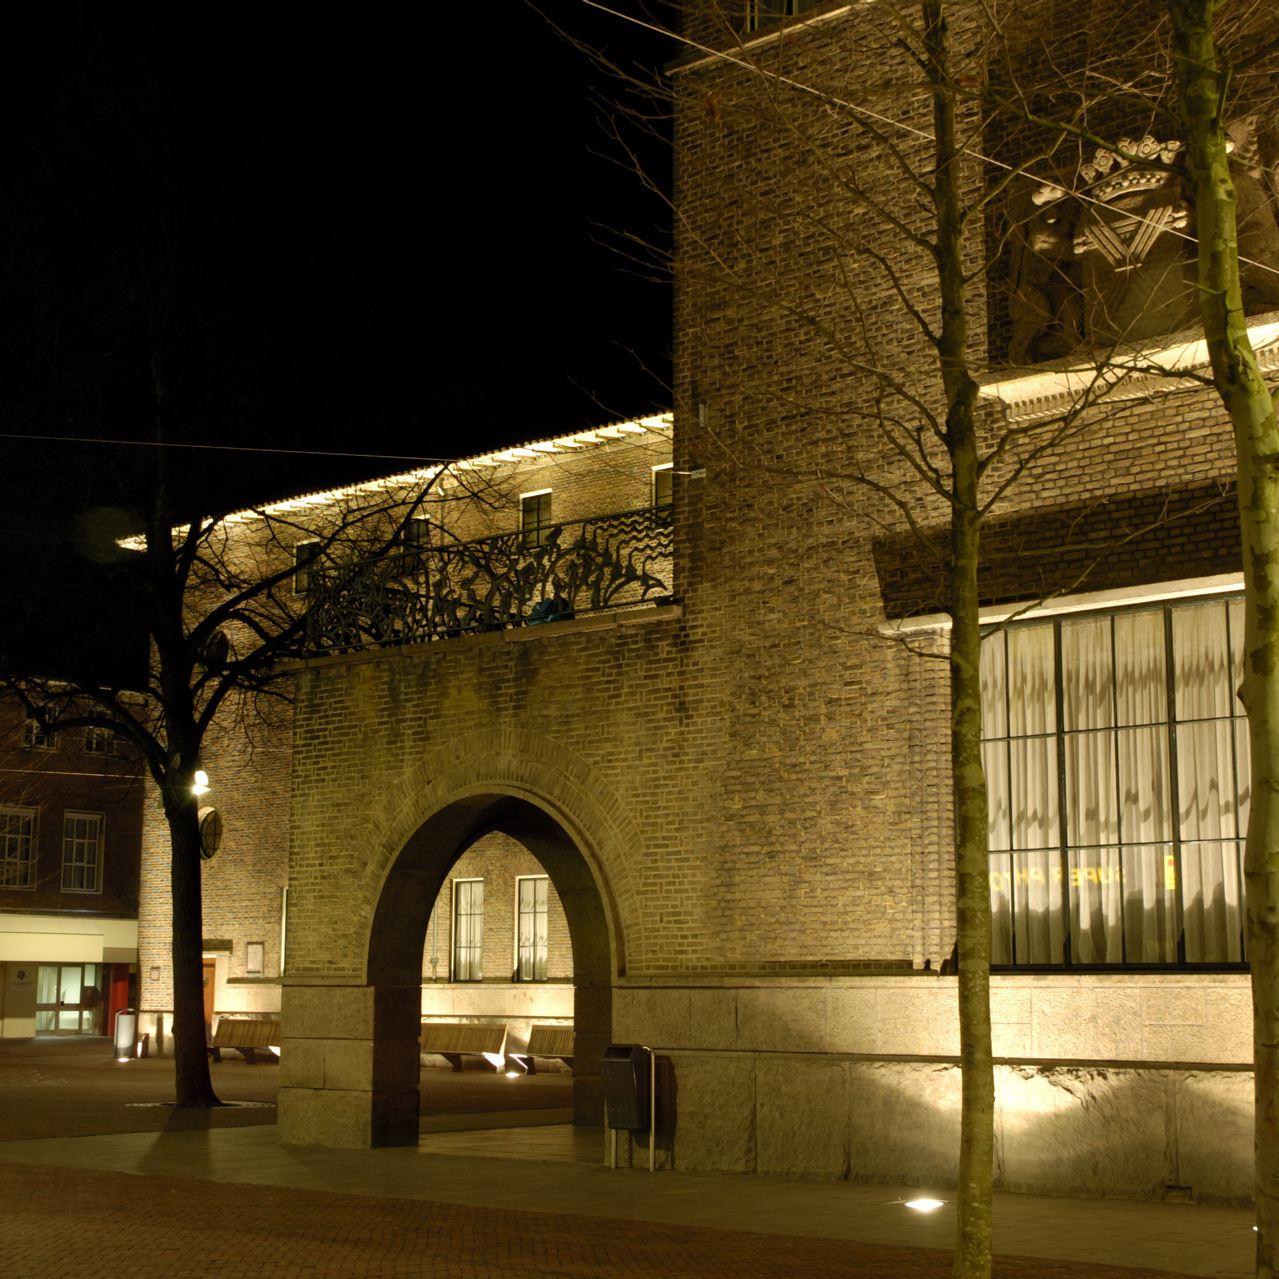 stadserf+Enschede,+stadhuis.jpg